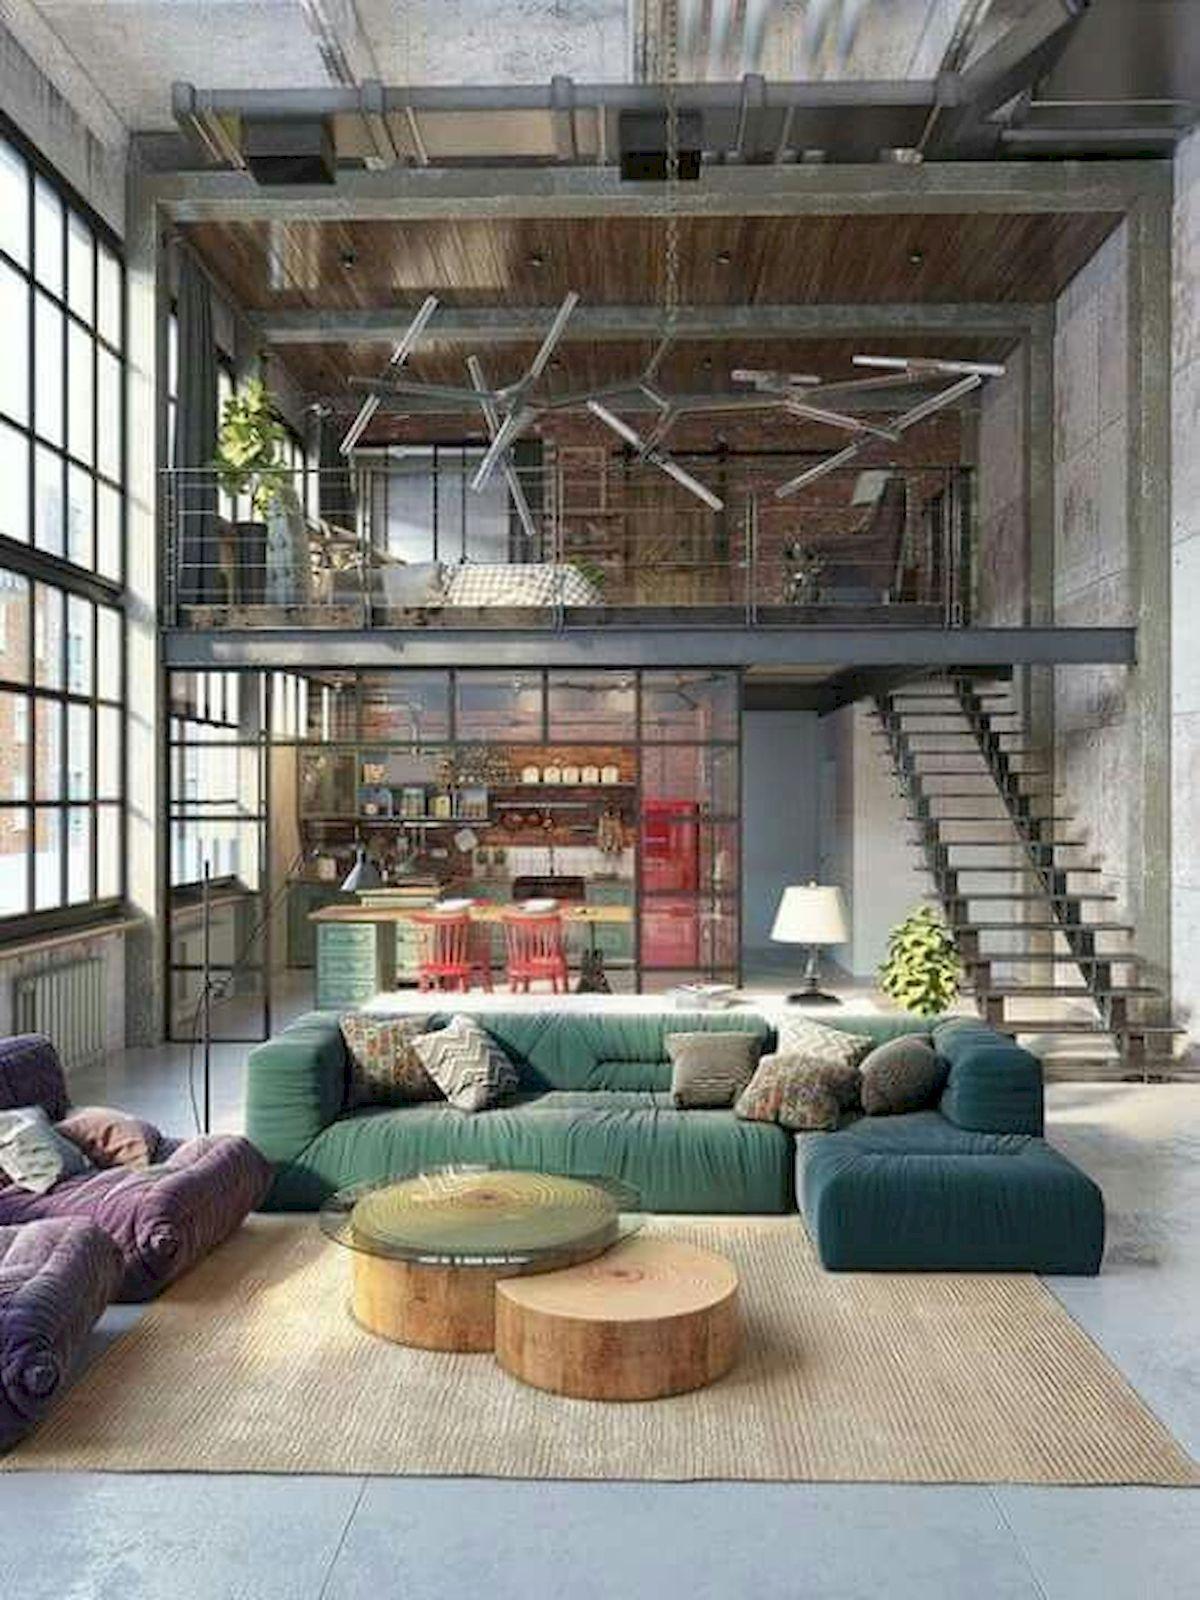 30 Awesome Loft Apartment Decorating Ideas Molitsy Blog In 2020 Small Loft Apartments Tiny House Loft Loft Interior Design